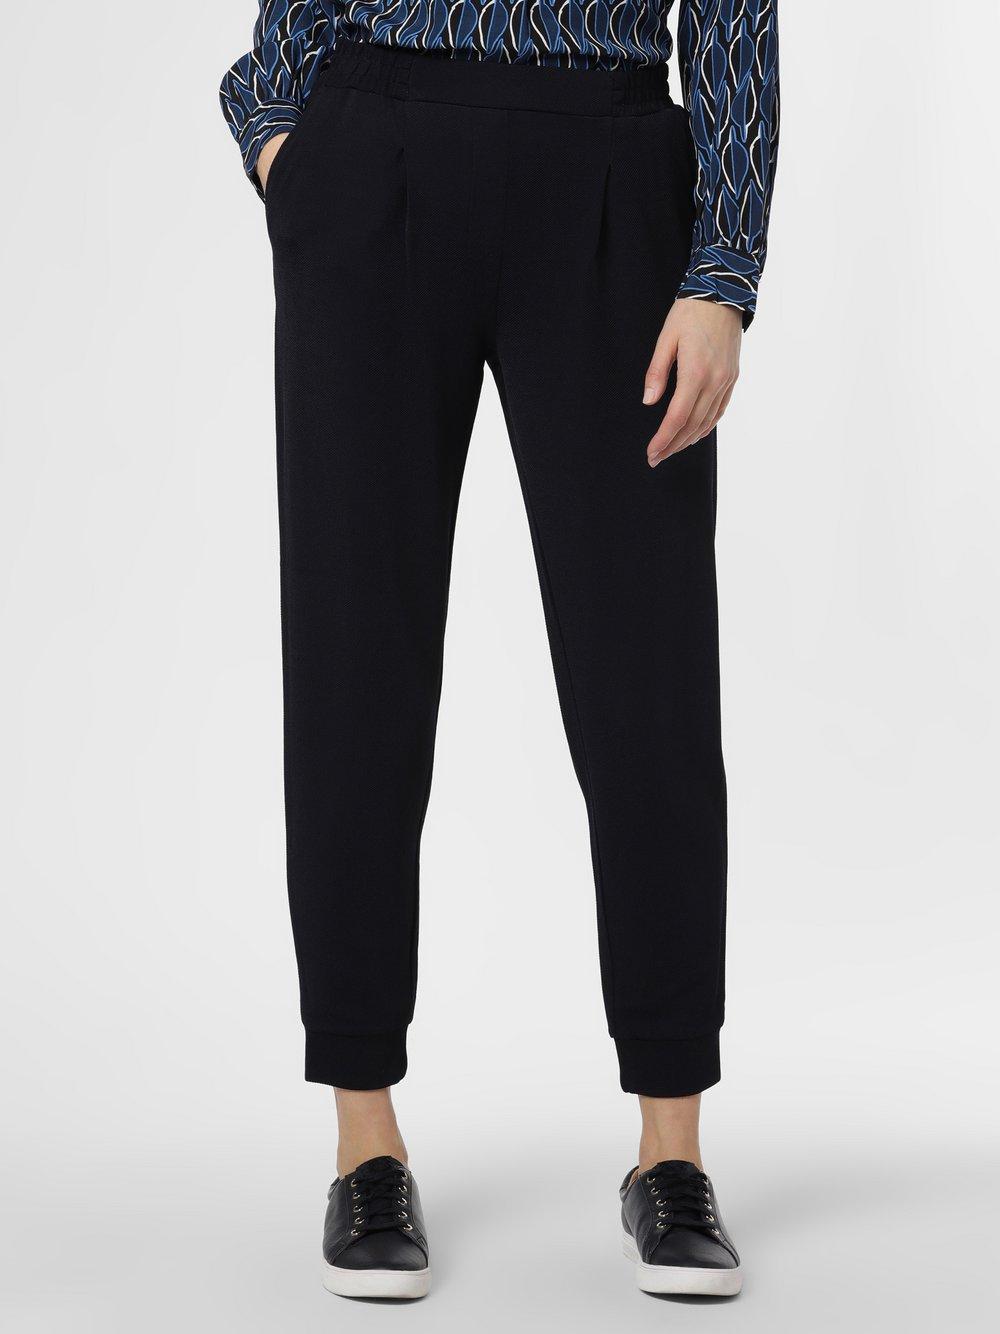 Someday - Spodnie damskie – Channo, niebieski